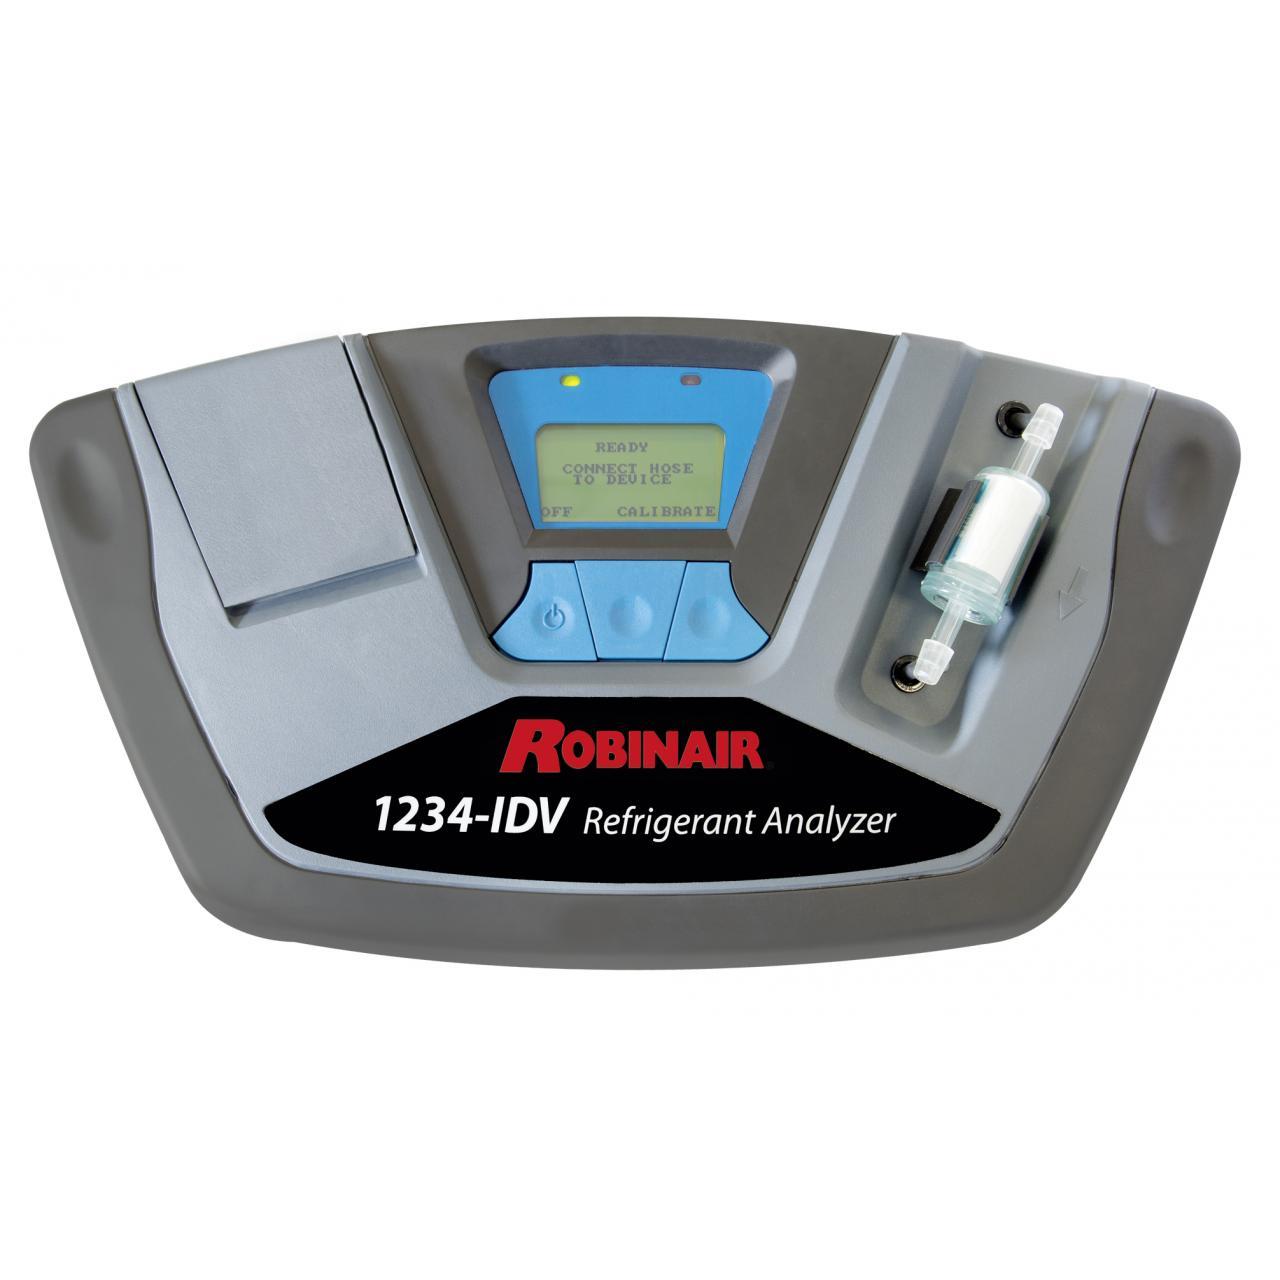 AC1234-IDV_-_R1234yf_Refrigerant_Identifier